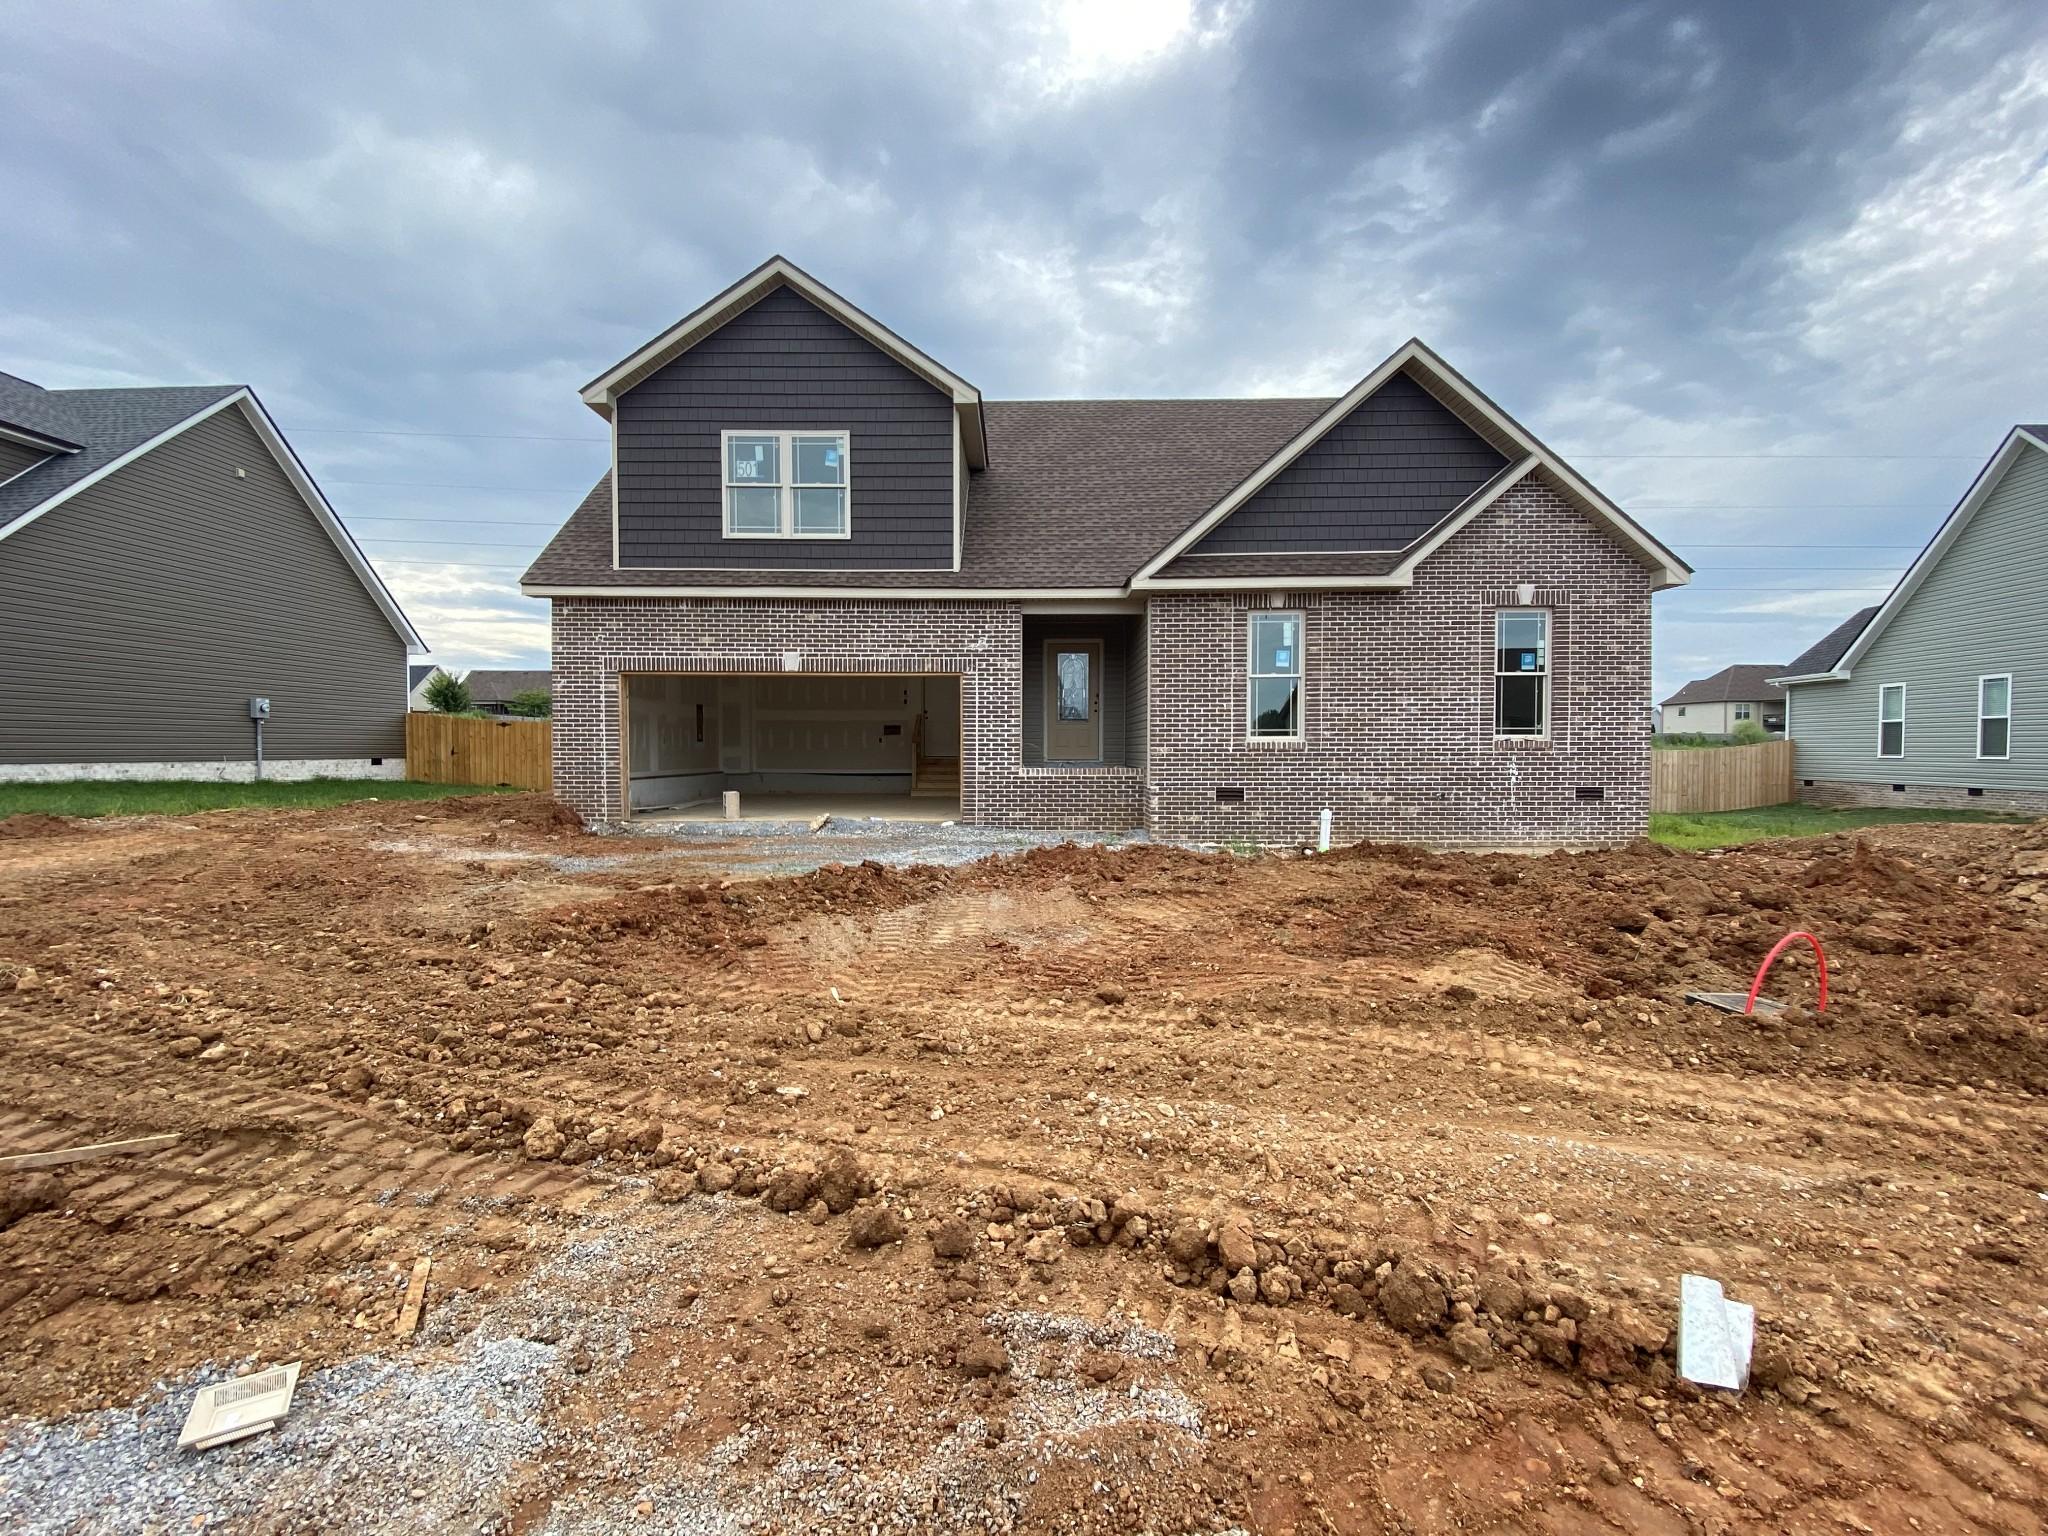 501 Autumnwood Farms Property Photo - Clarksville, TN real estate listing